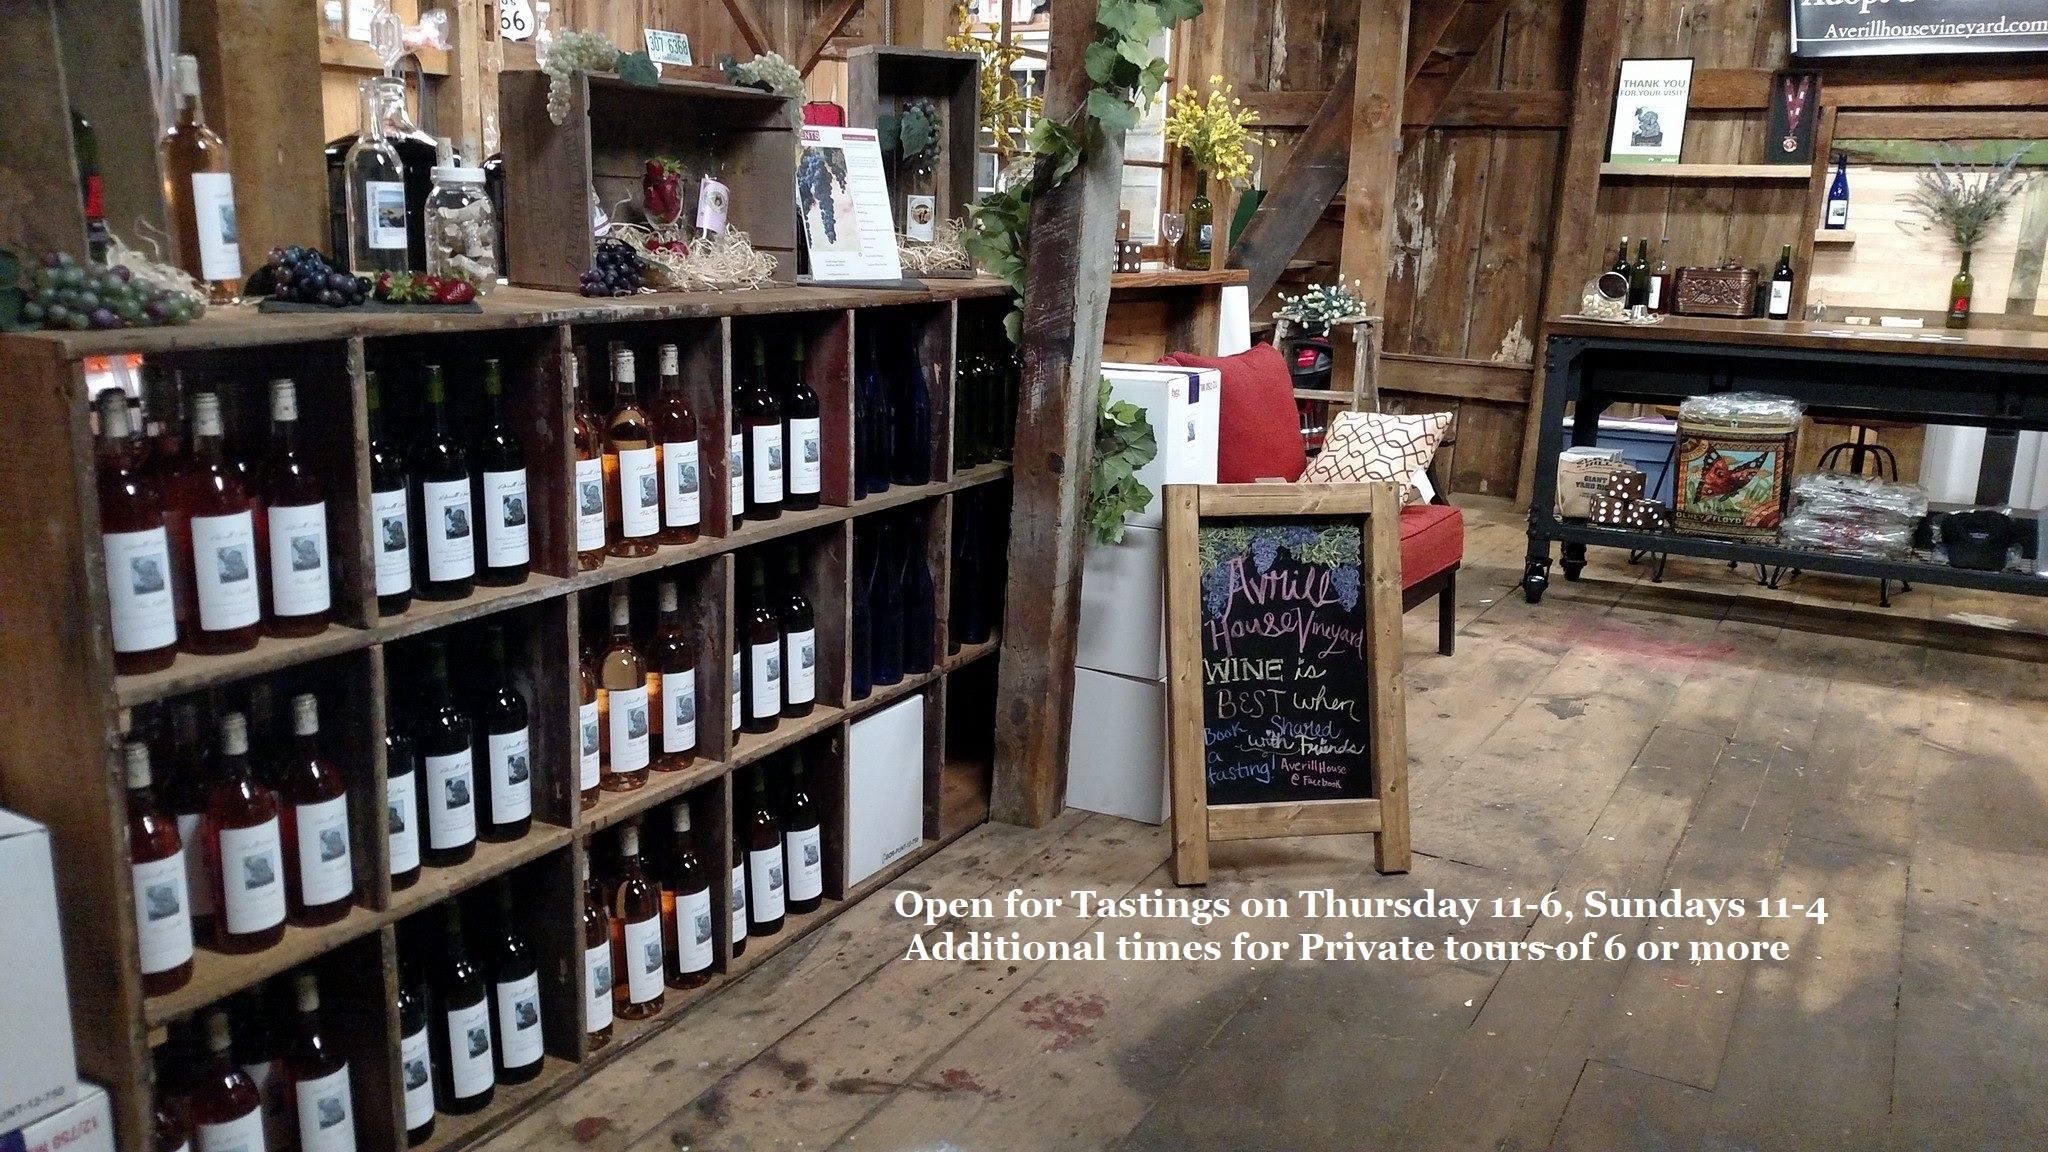 Averill House Vineyard Wine case